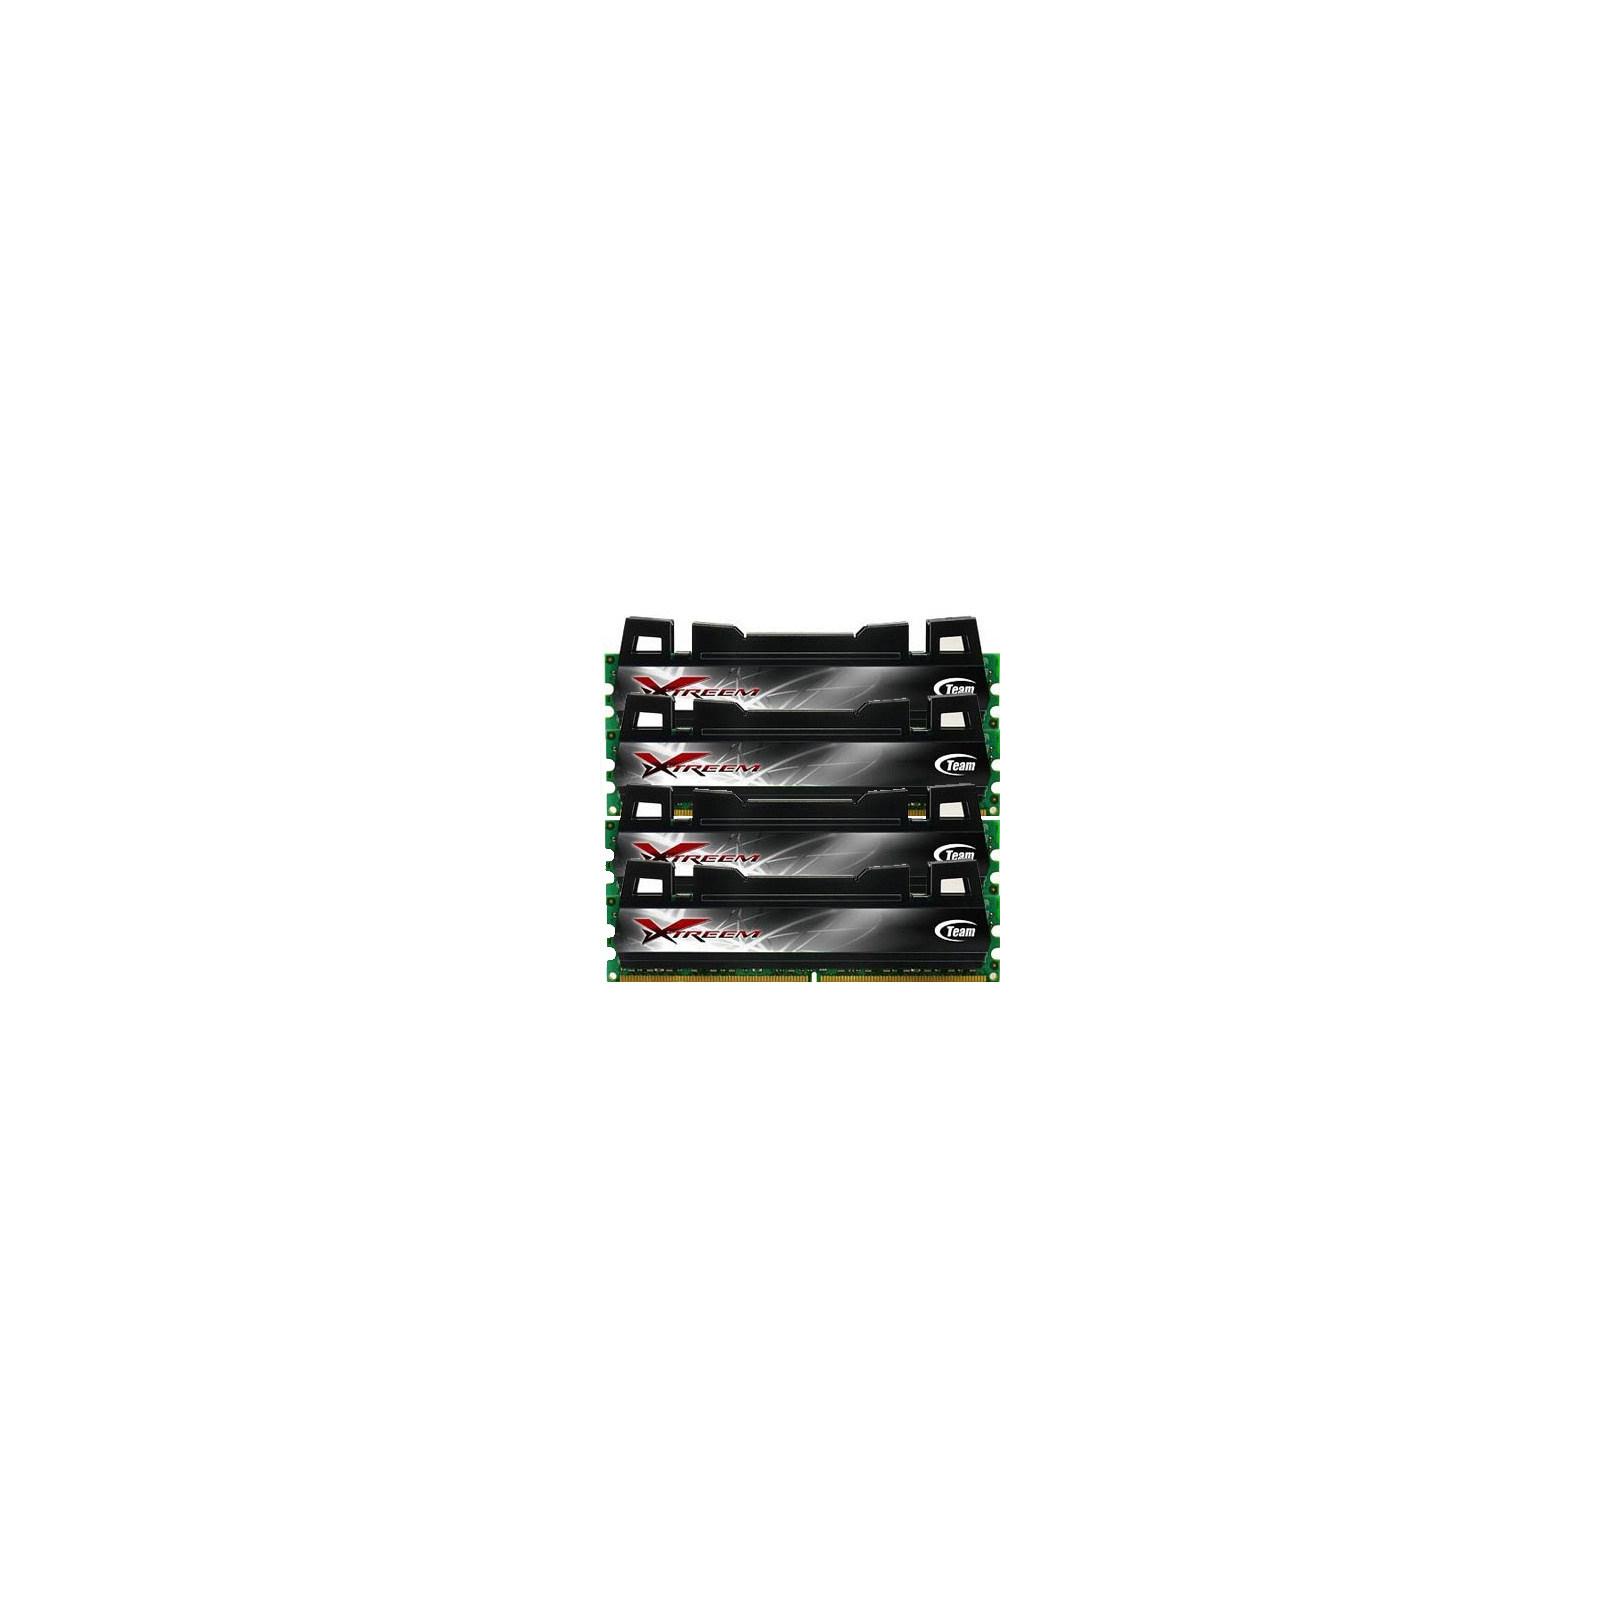 Модуль памяти для компьютера DDR3 32GB (4x8GB) 2400 MHz Team (TXD332G2400HC10QQC01)